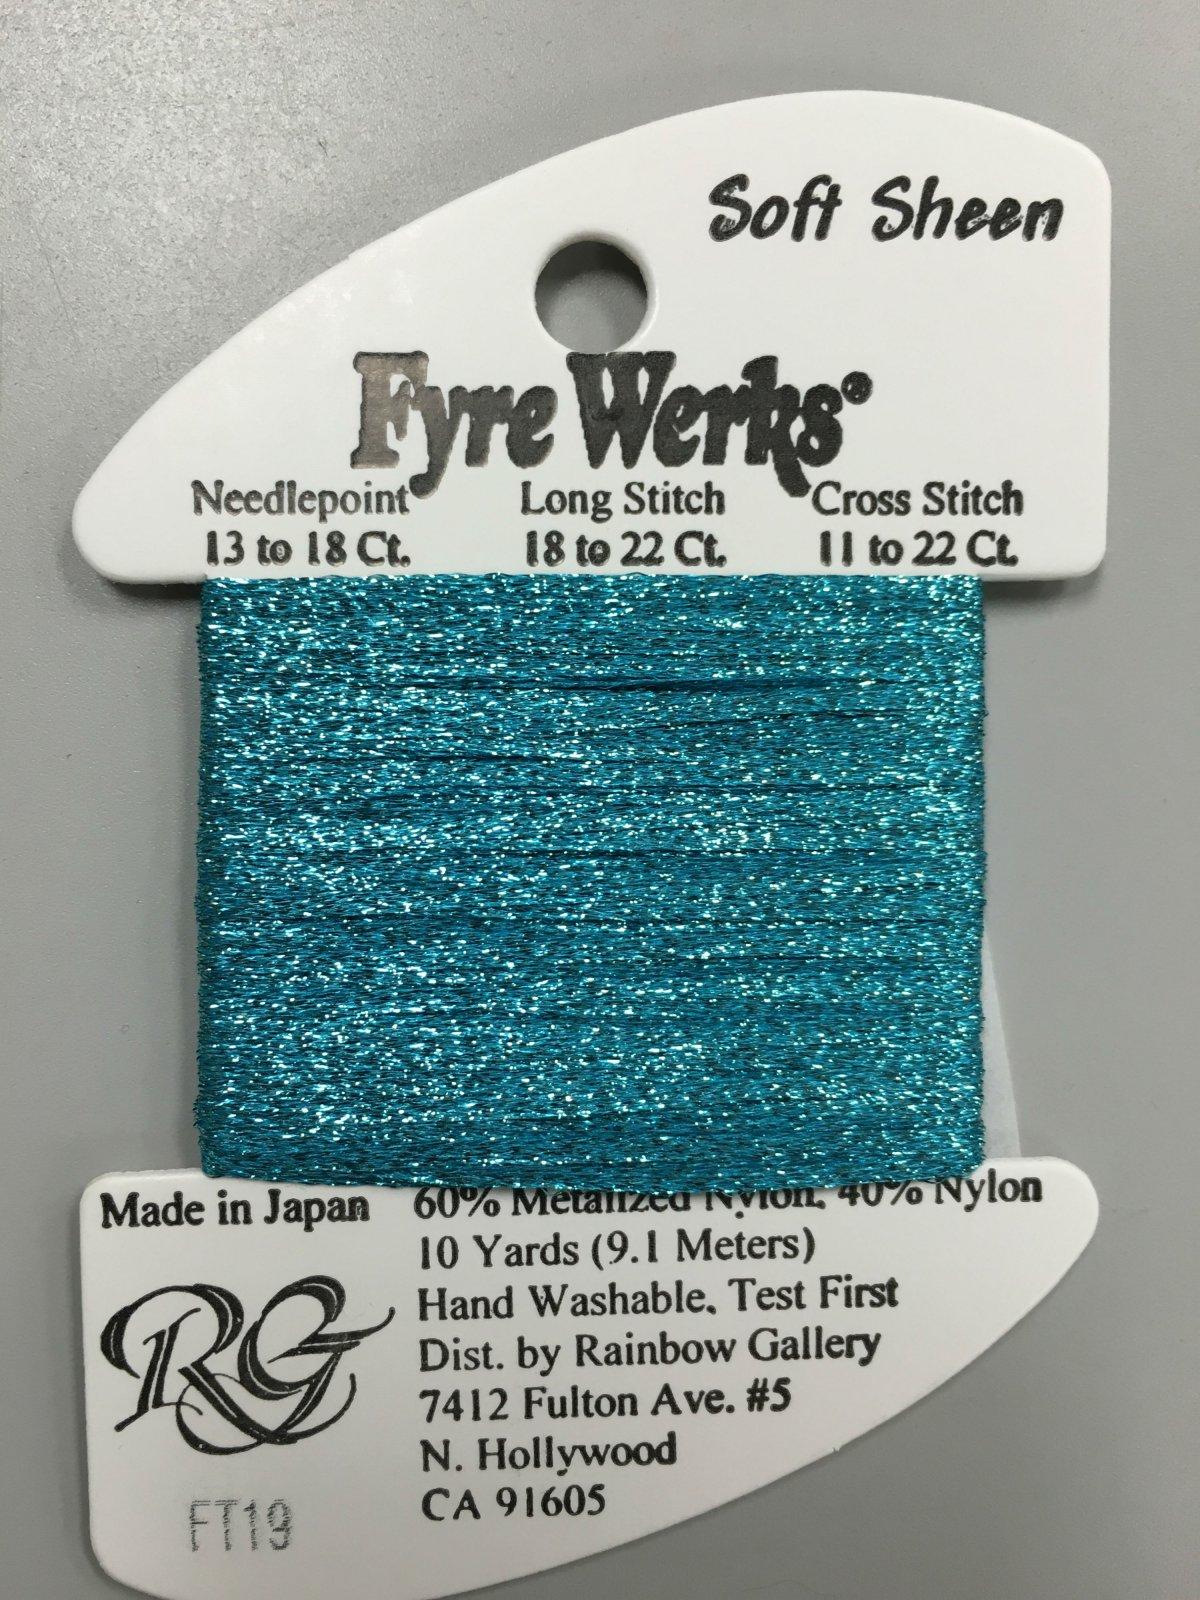 Fyre Werks Soft Sheen FT19